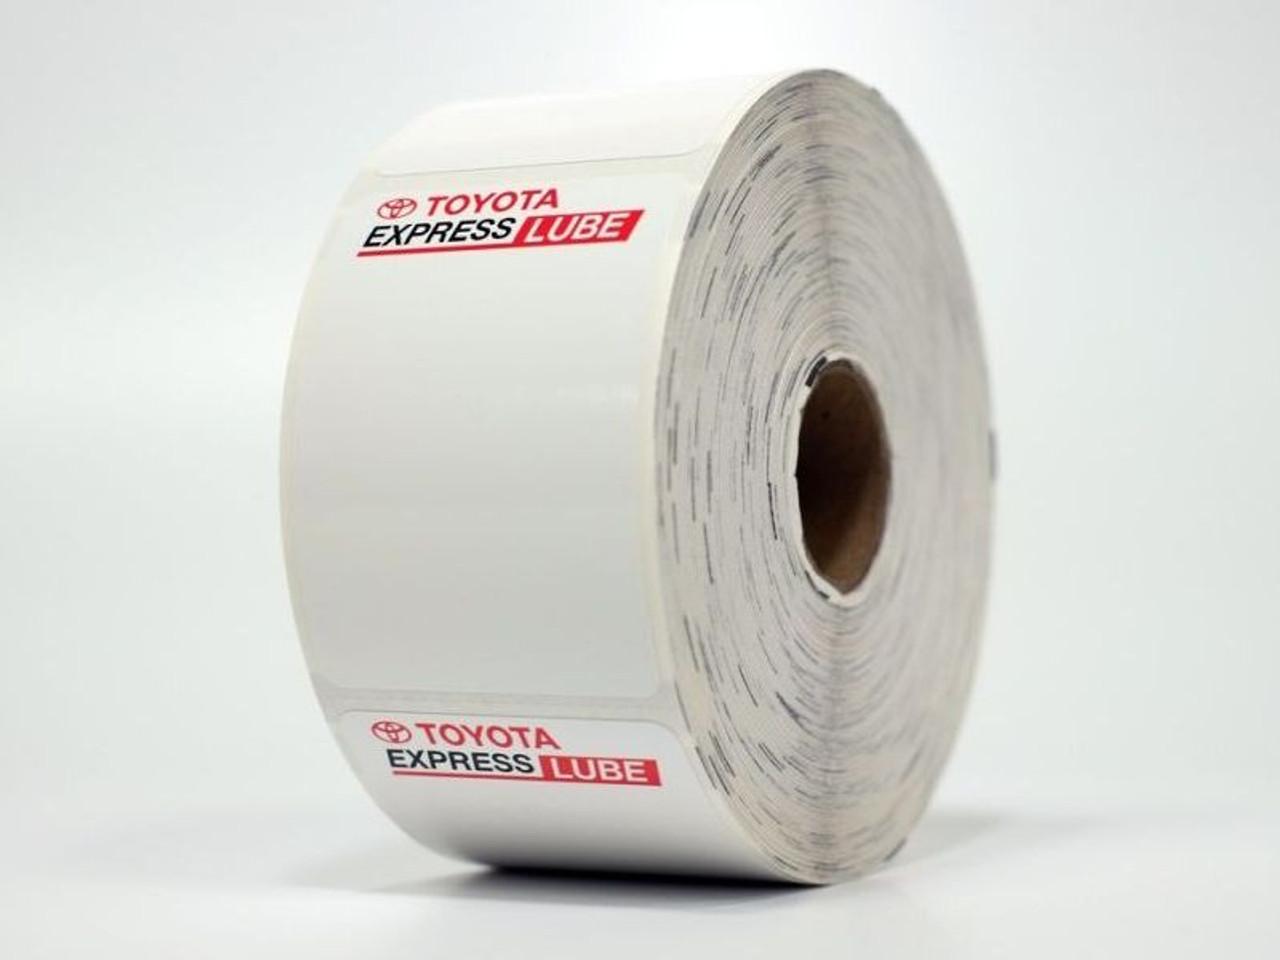 Toyota Express Lube Oil Change Sticker for Printer